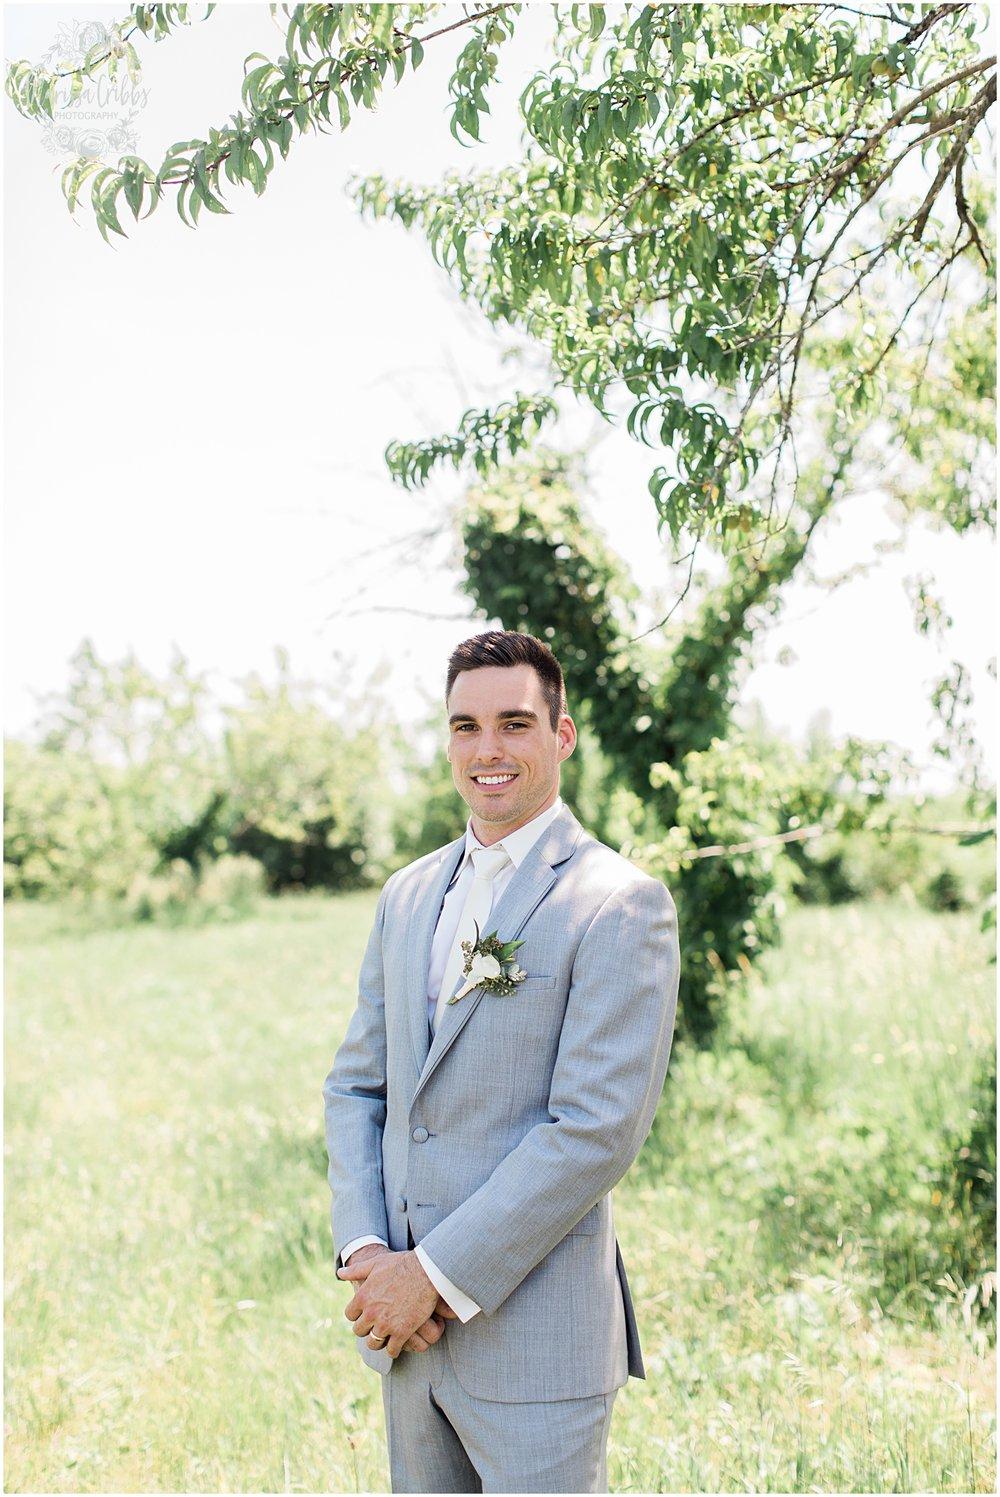 RHODES WEDDING | WESTON RED BARN FARM | MARISSA CRIBBS PHOTOGRAPHY_5241.jpg